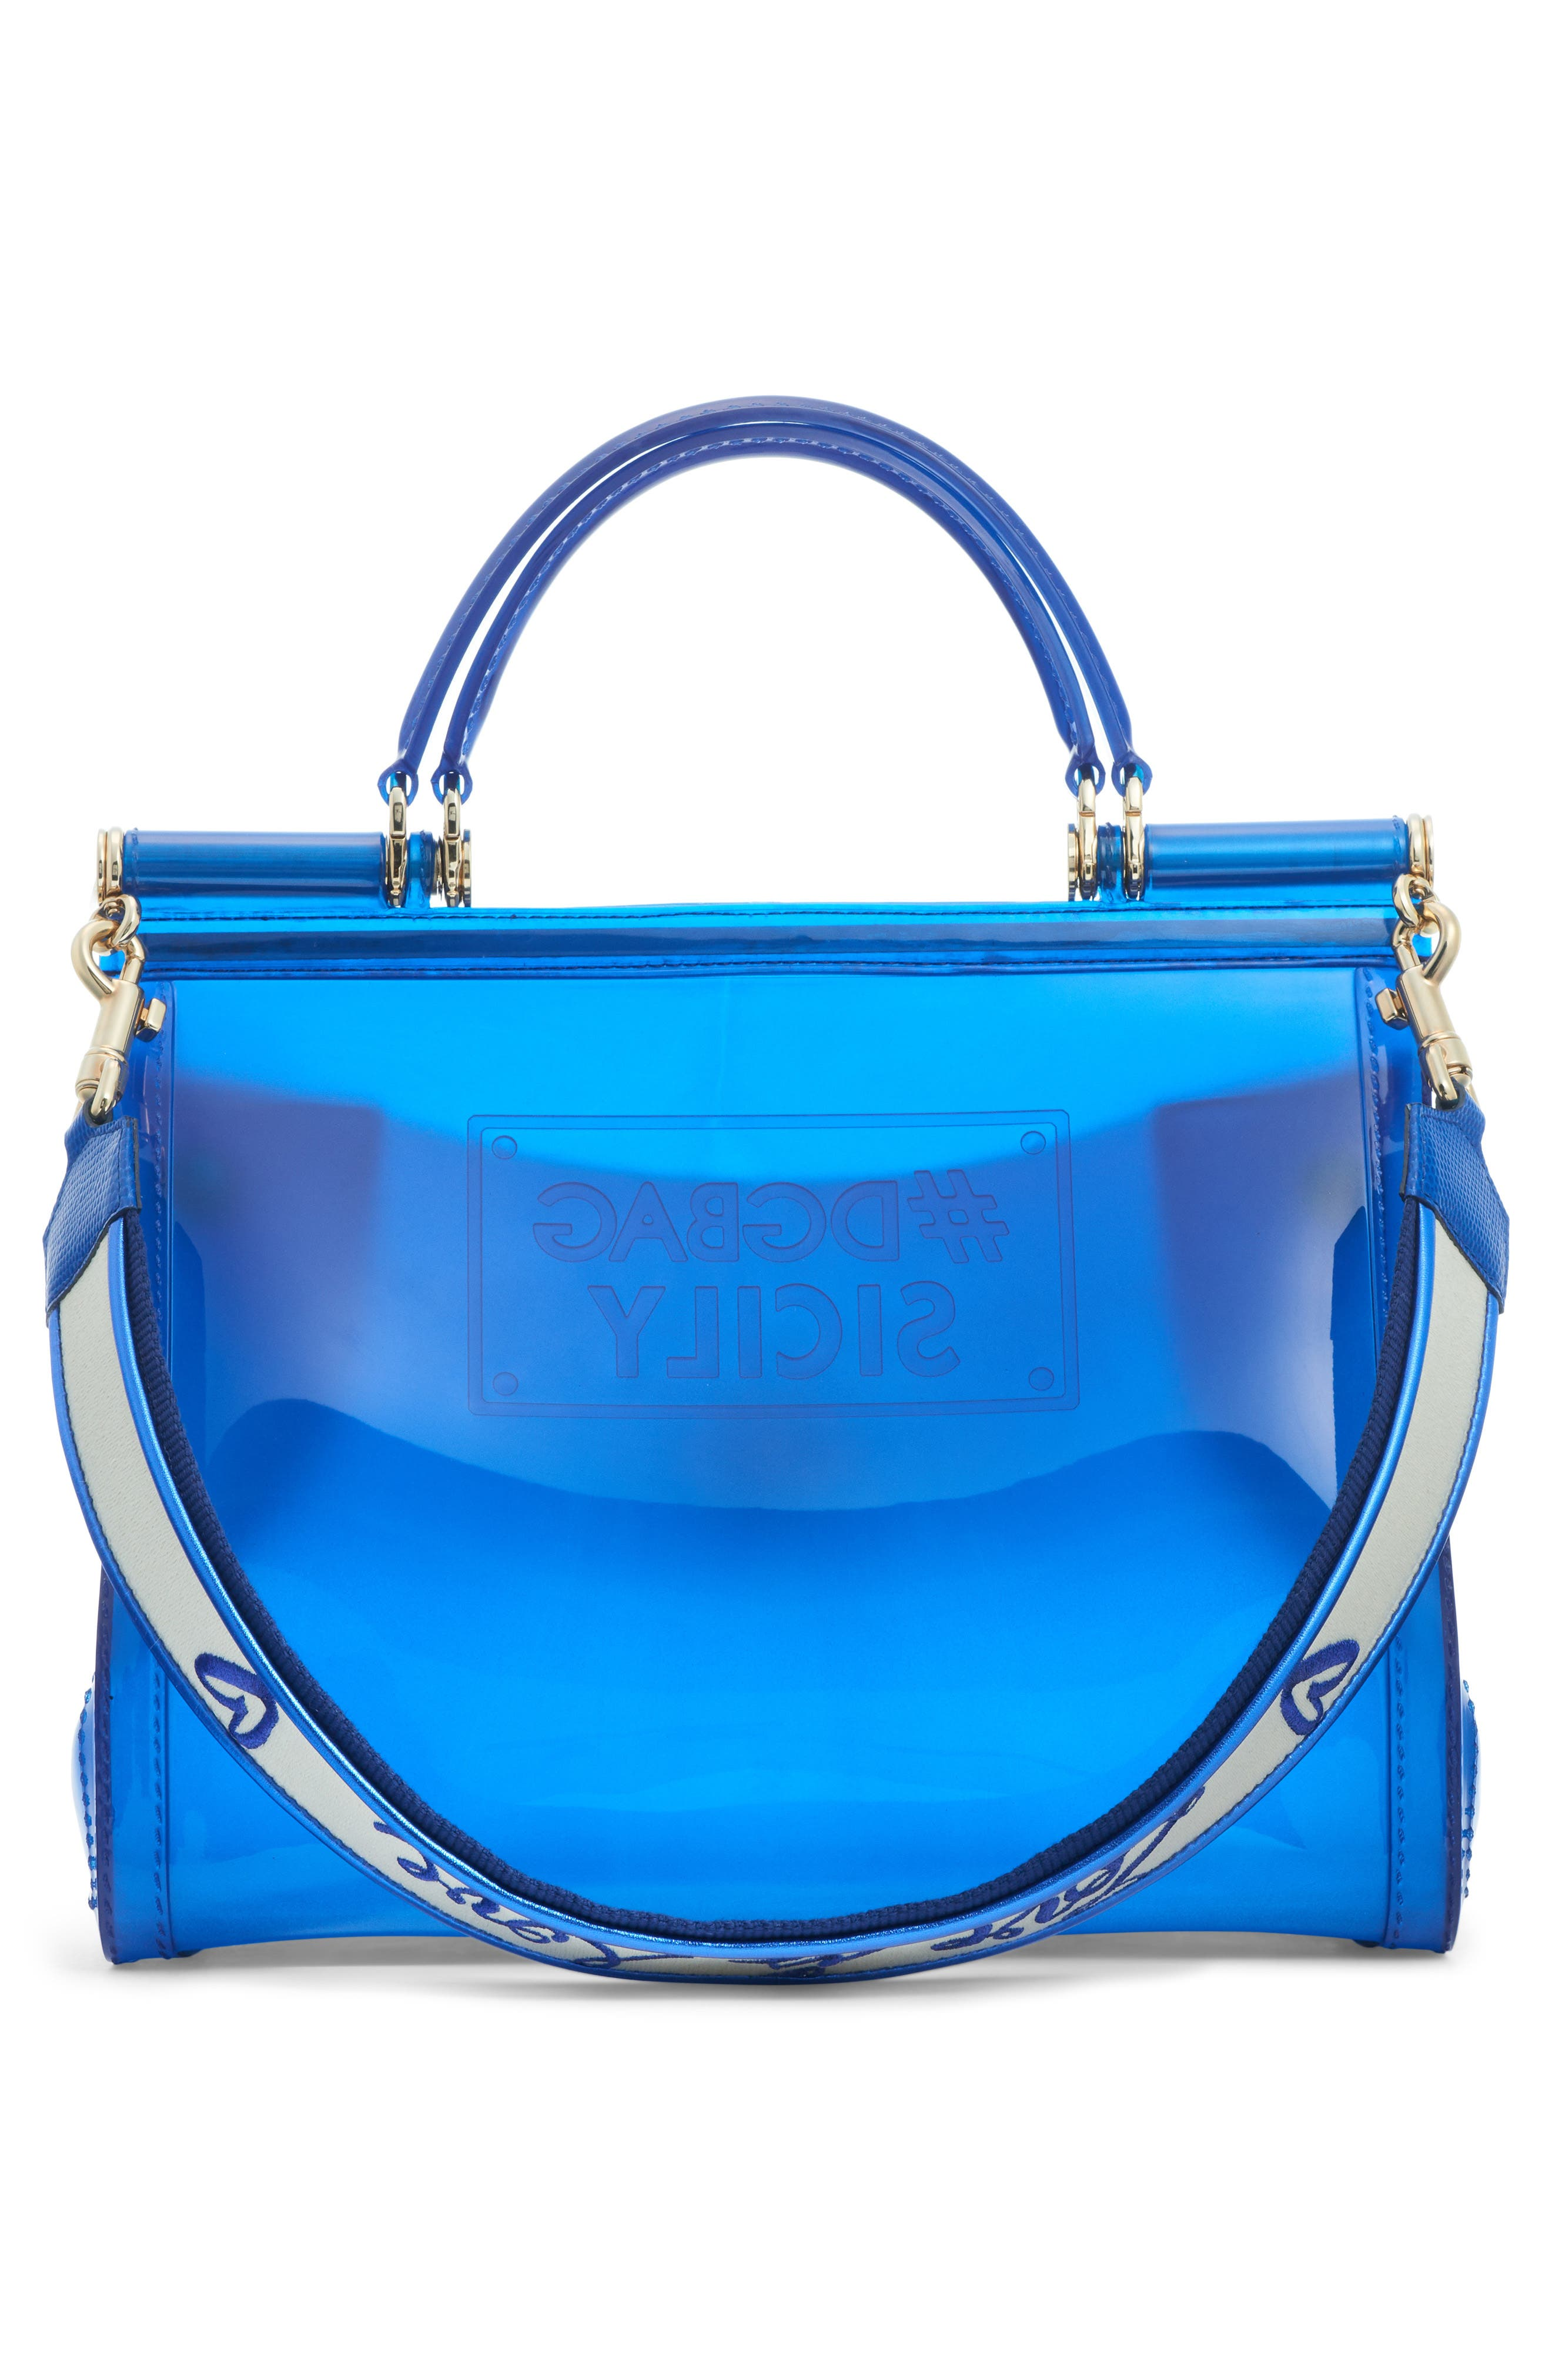 Medium Miss Sicily PVC Satchel,                             Alternate thumbnail 3, color,                             Blue Multi